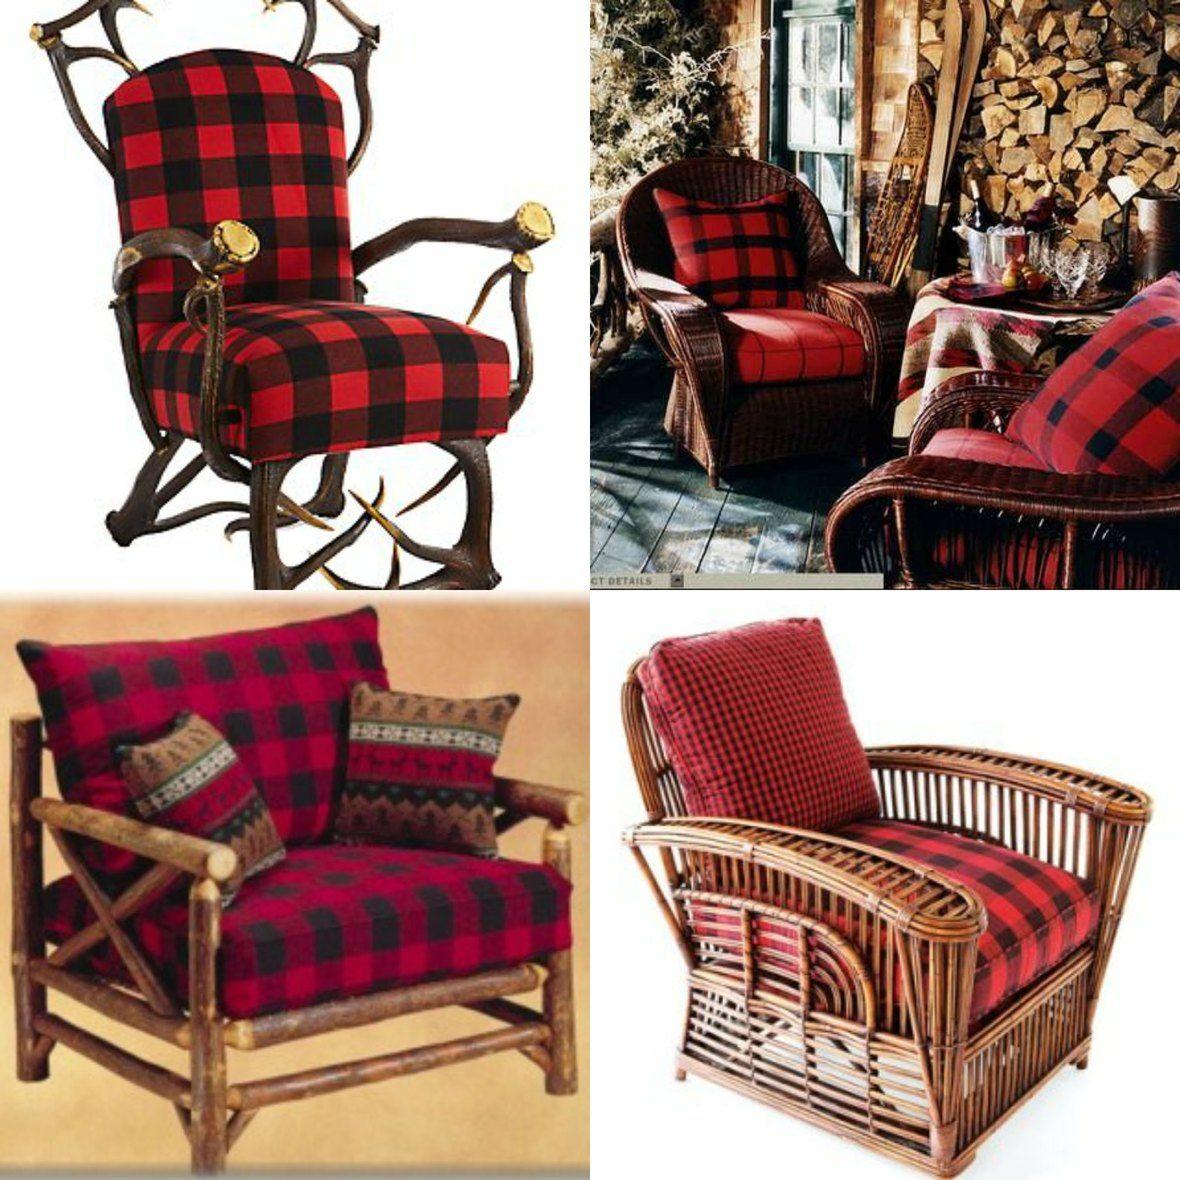 Buffalo Plaid Chairs